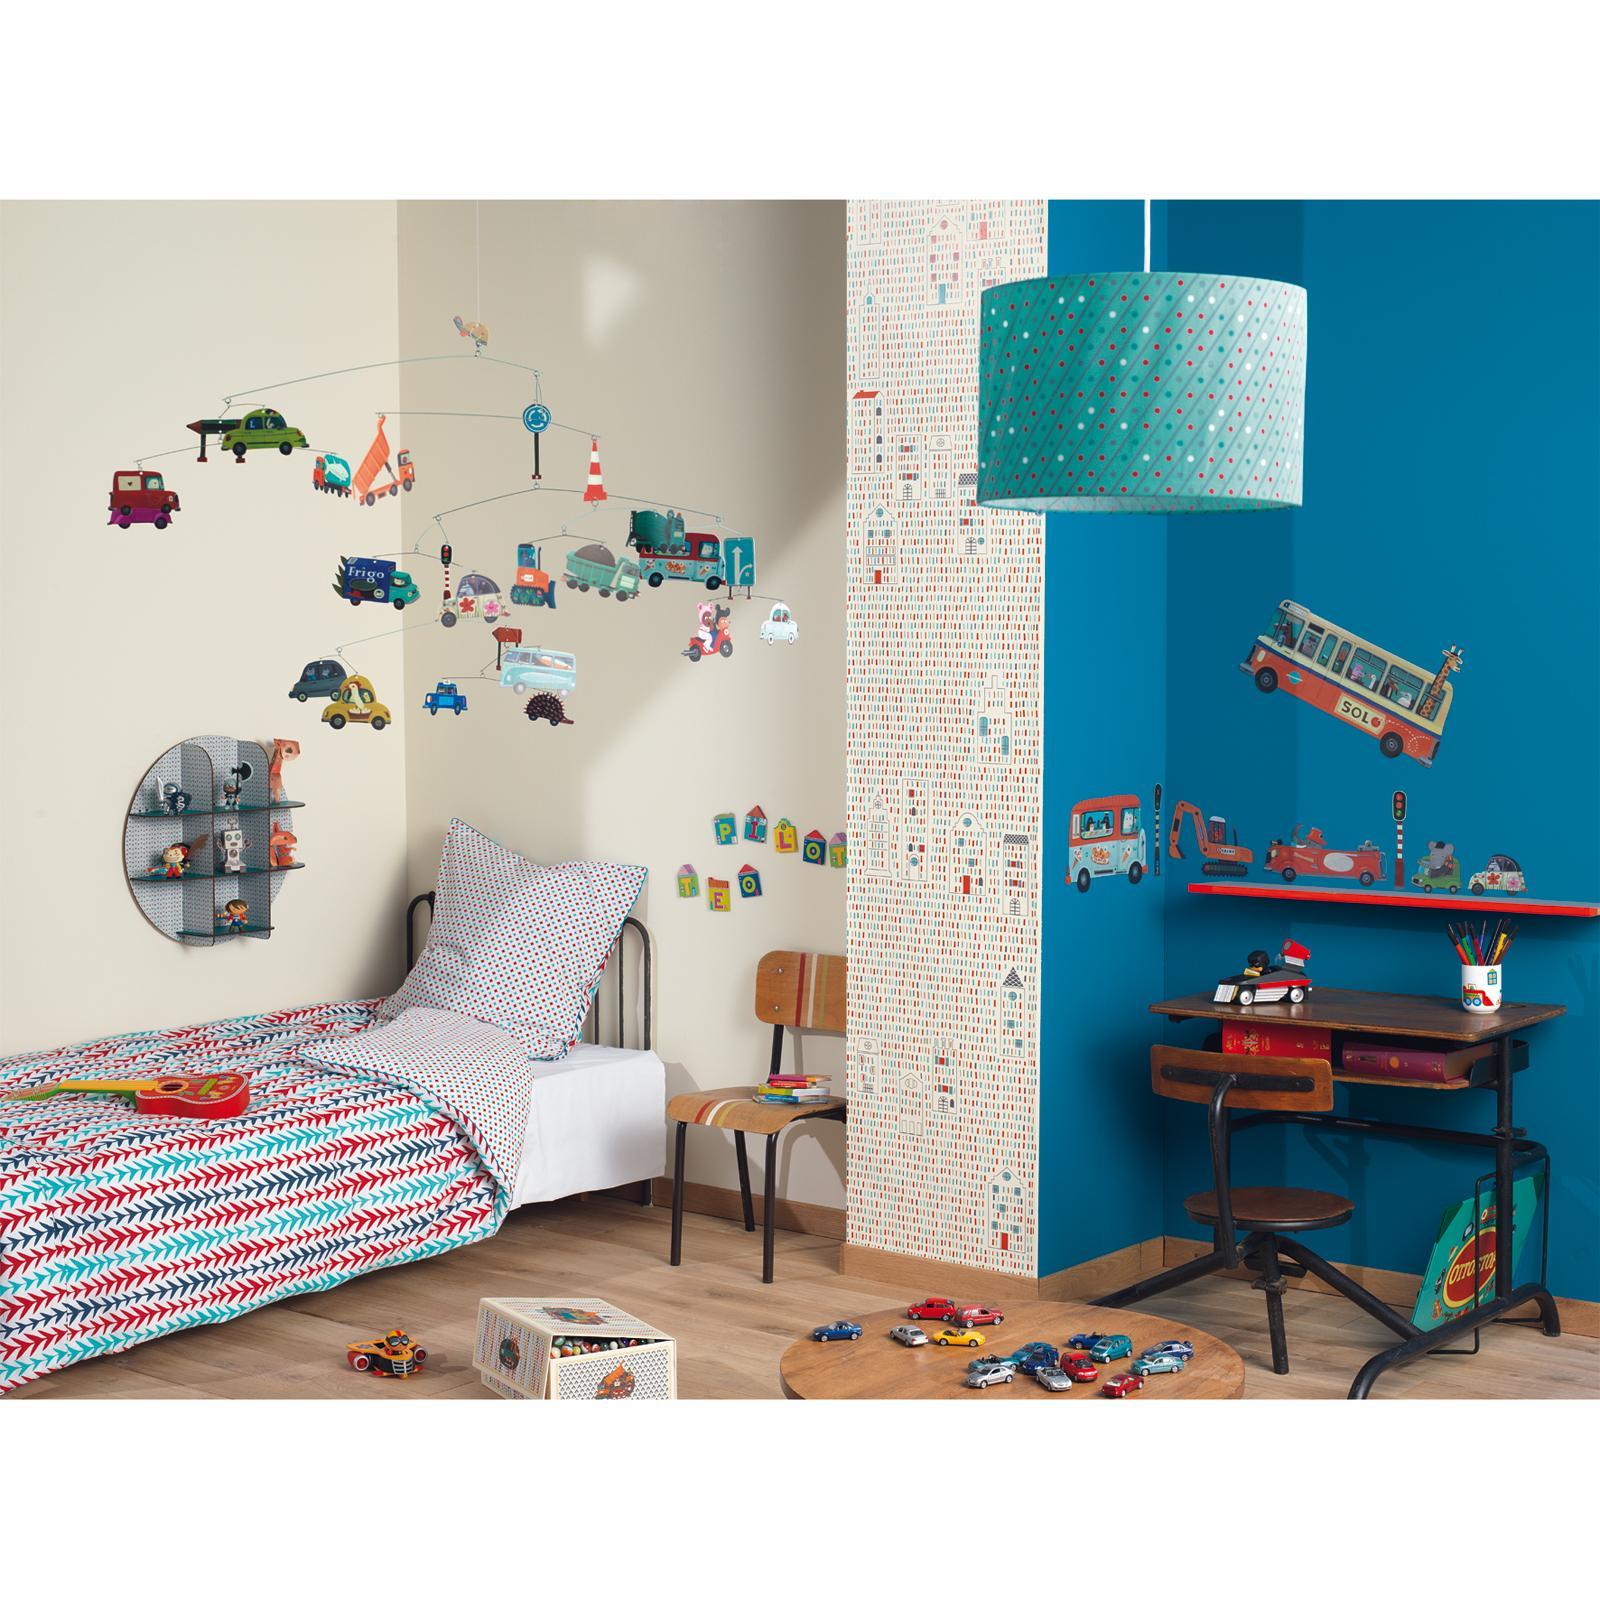 Abat-jour tissu Pois : Little big room by Djeco